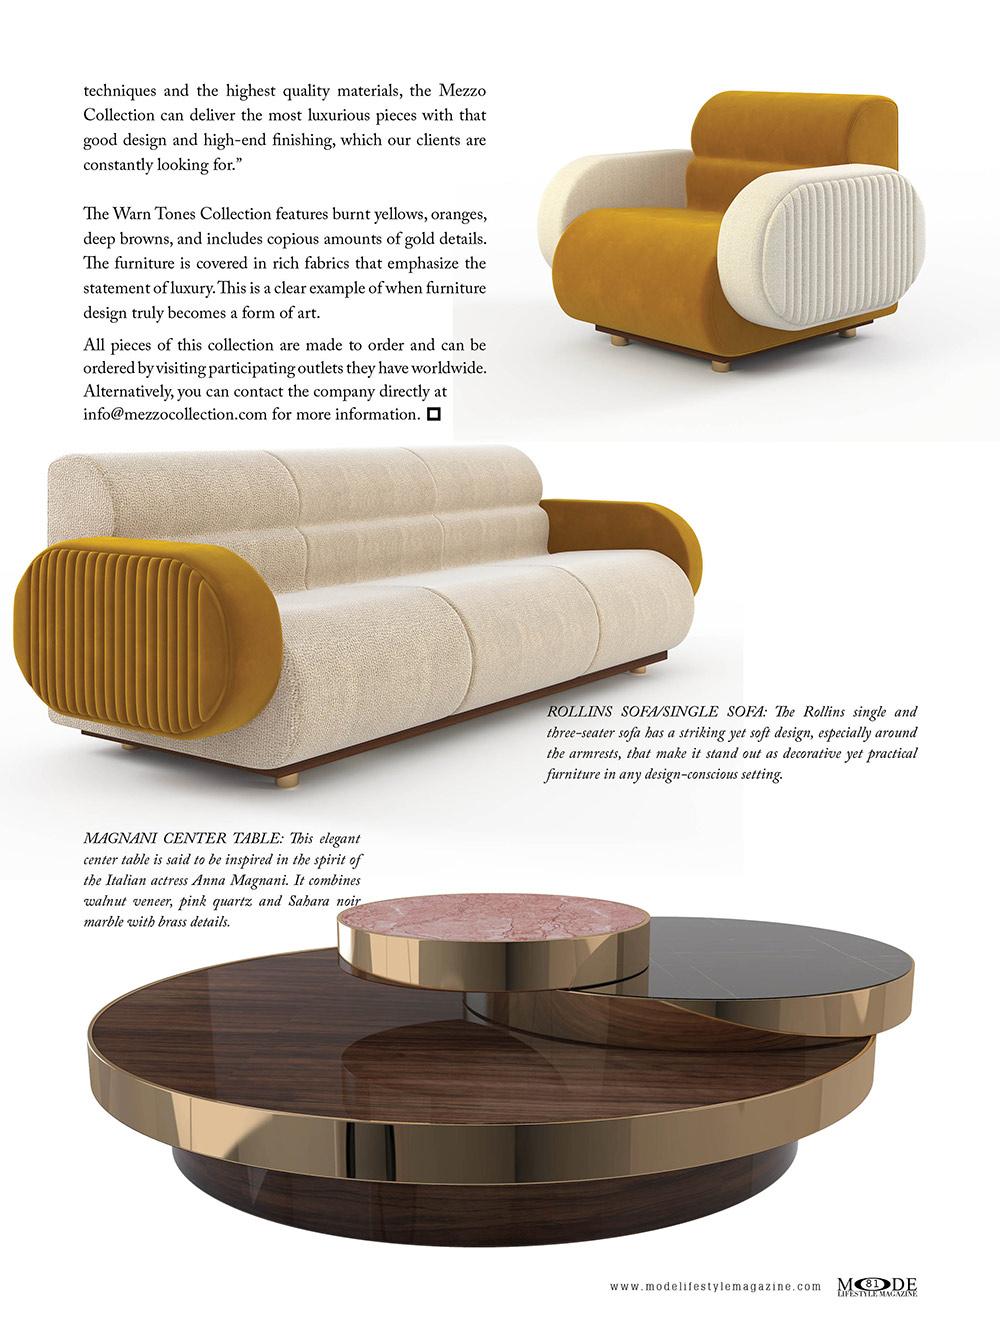 MAGNANI CENTER TABLE: Warm Tones - Mezzo Collection